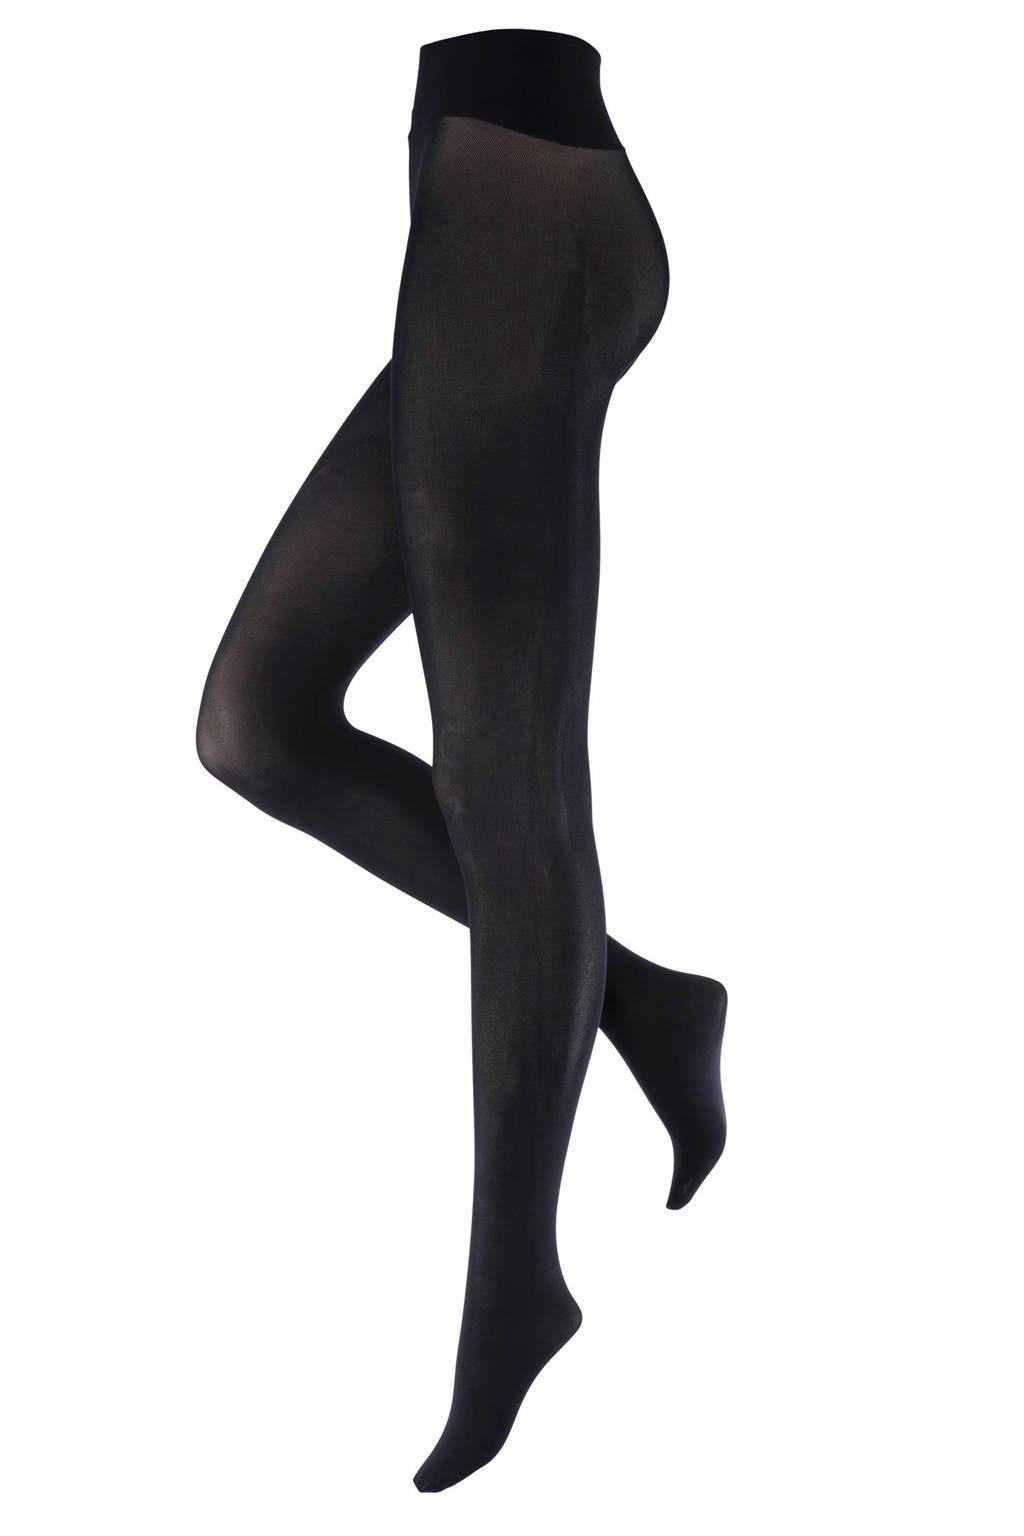 SISI panty Anti Cellulite 40 denier zwart, Zwart